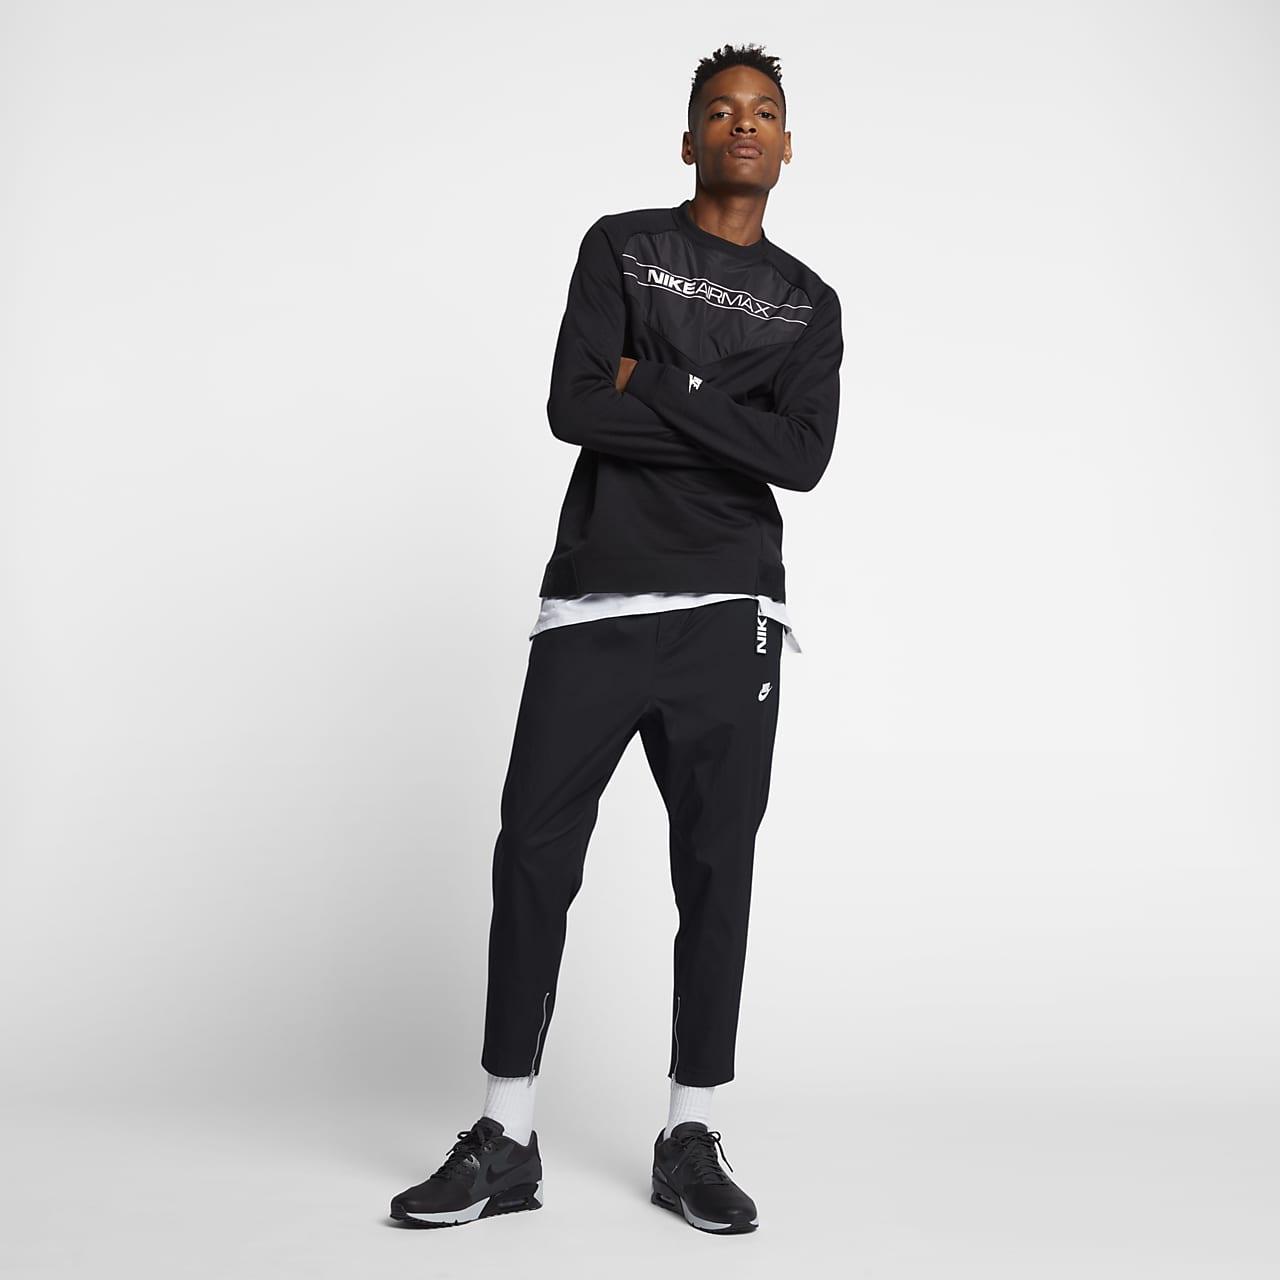 Nike Sportswear Air Max Men's Woven Trousers